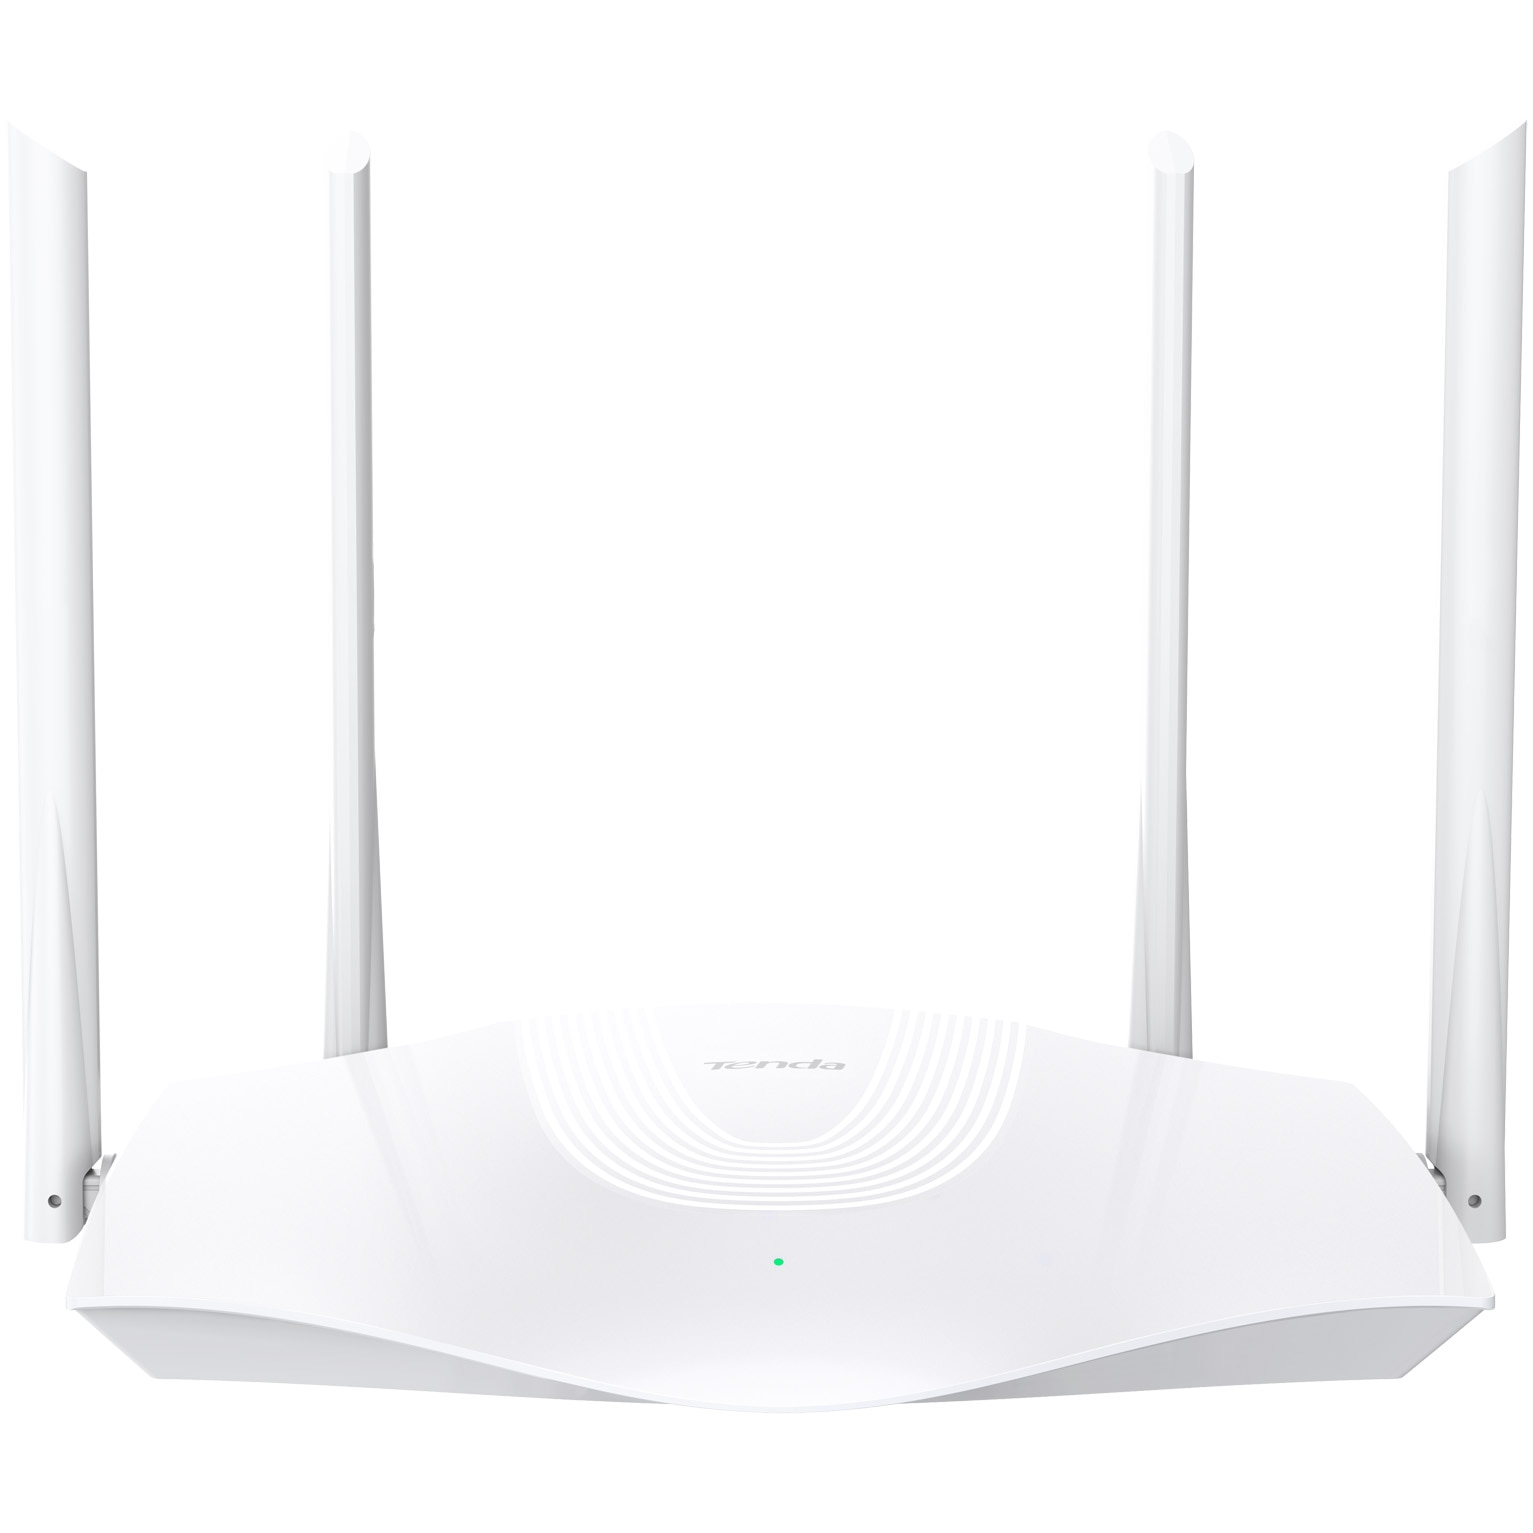 Fotografie Router wireless Tenda RX3, Wi-Fi 6, AX1800, Gigabit, dual-band